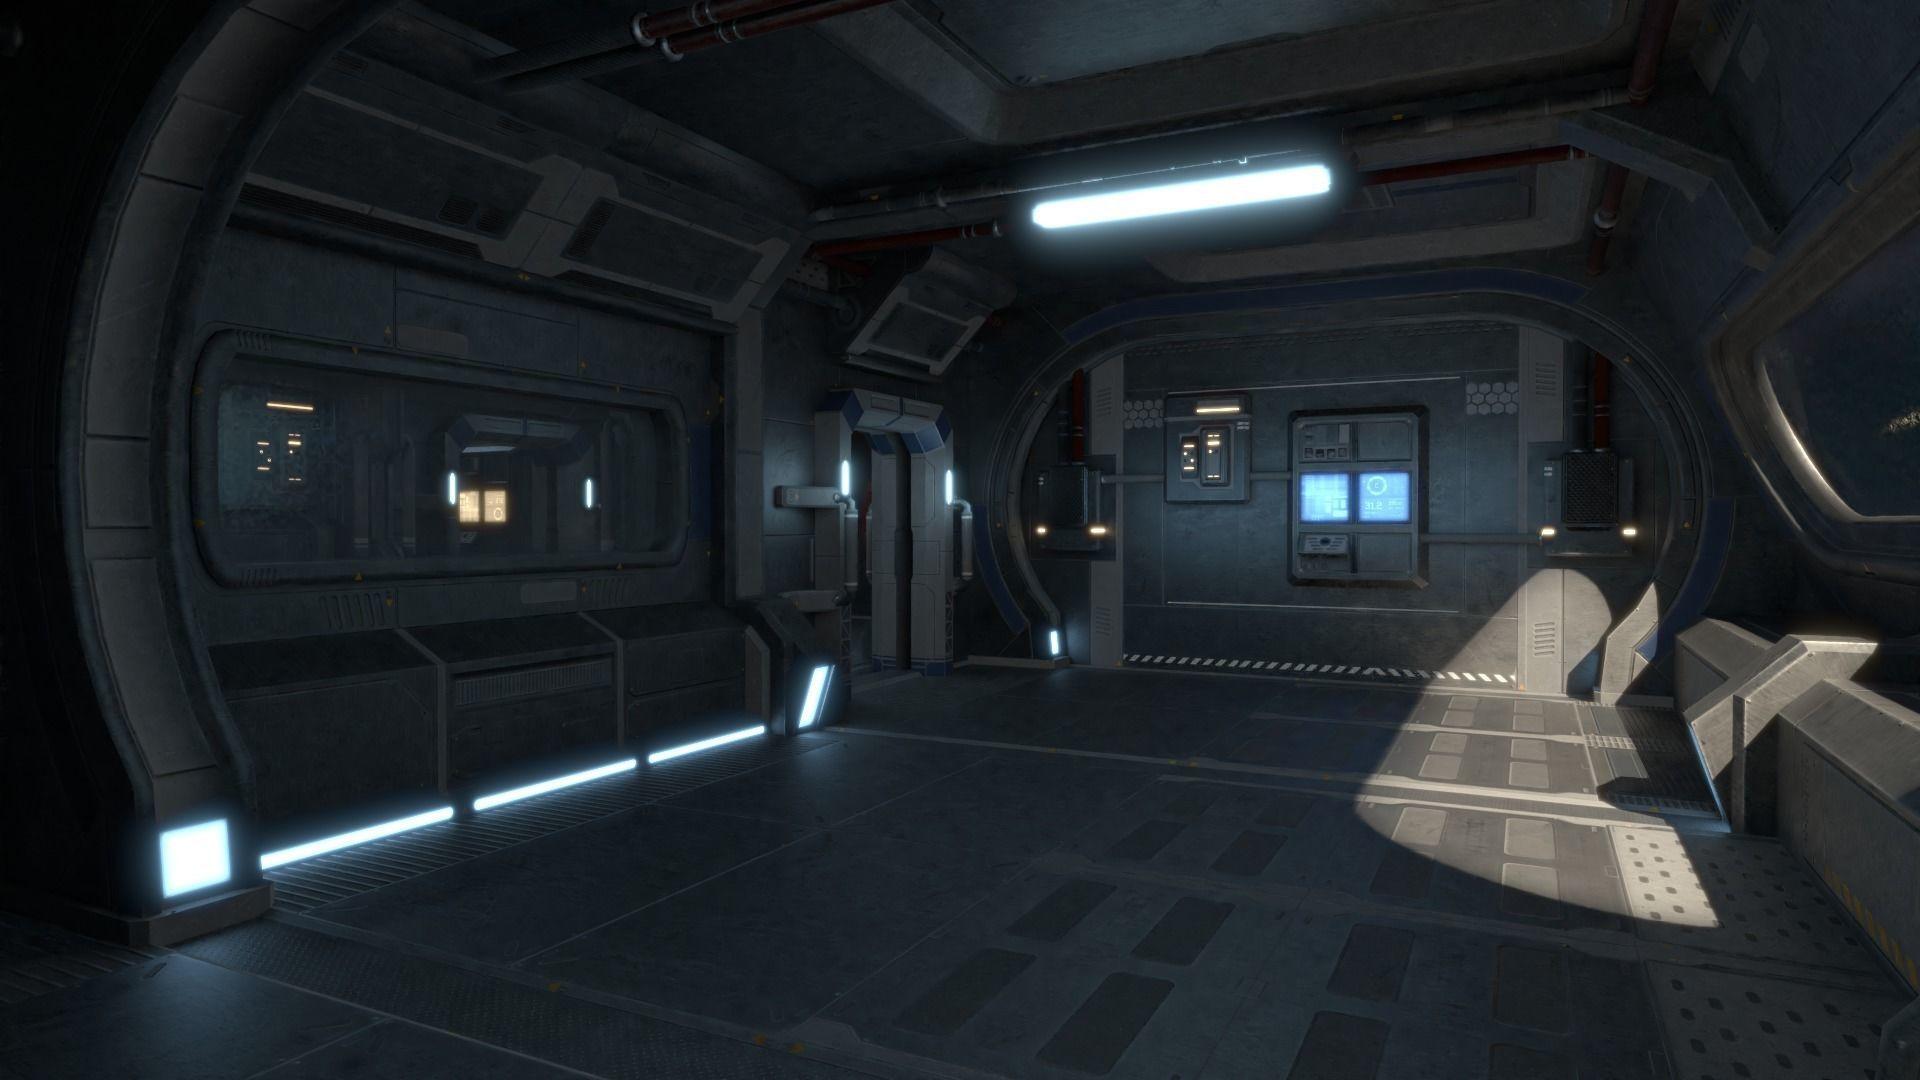 Intrepid spaceship